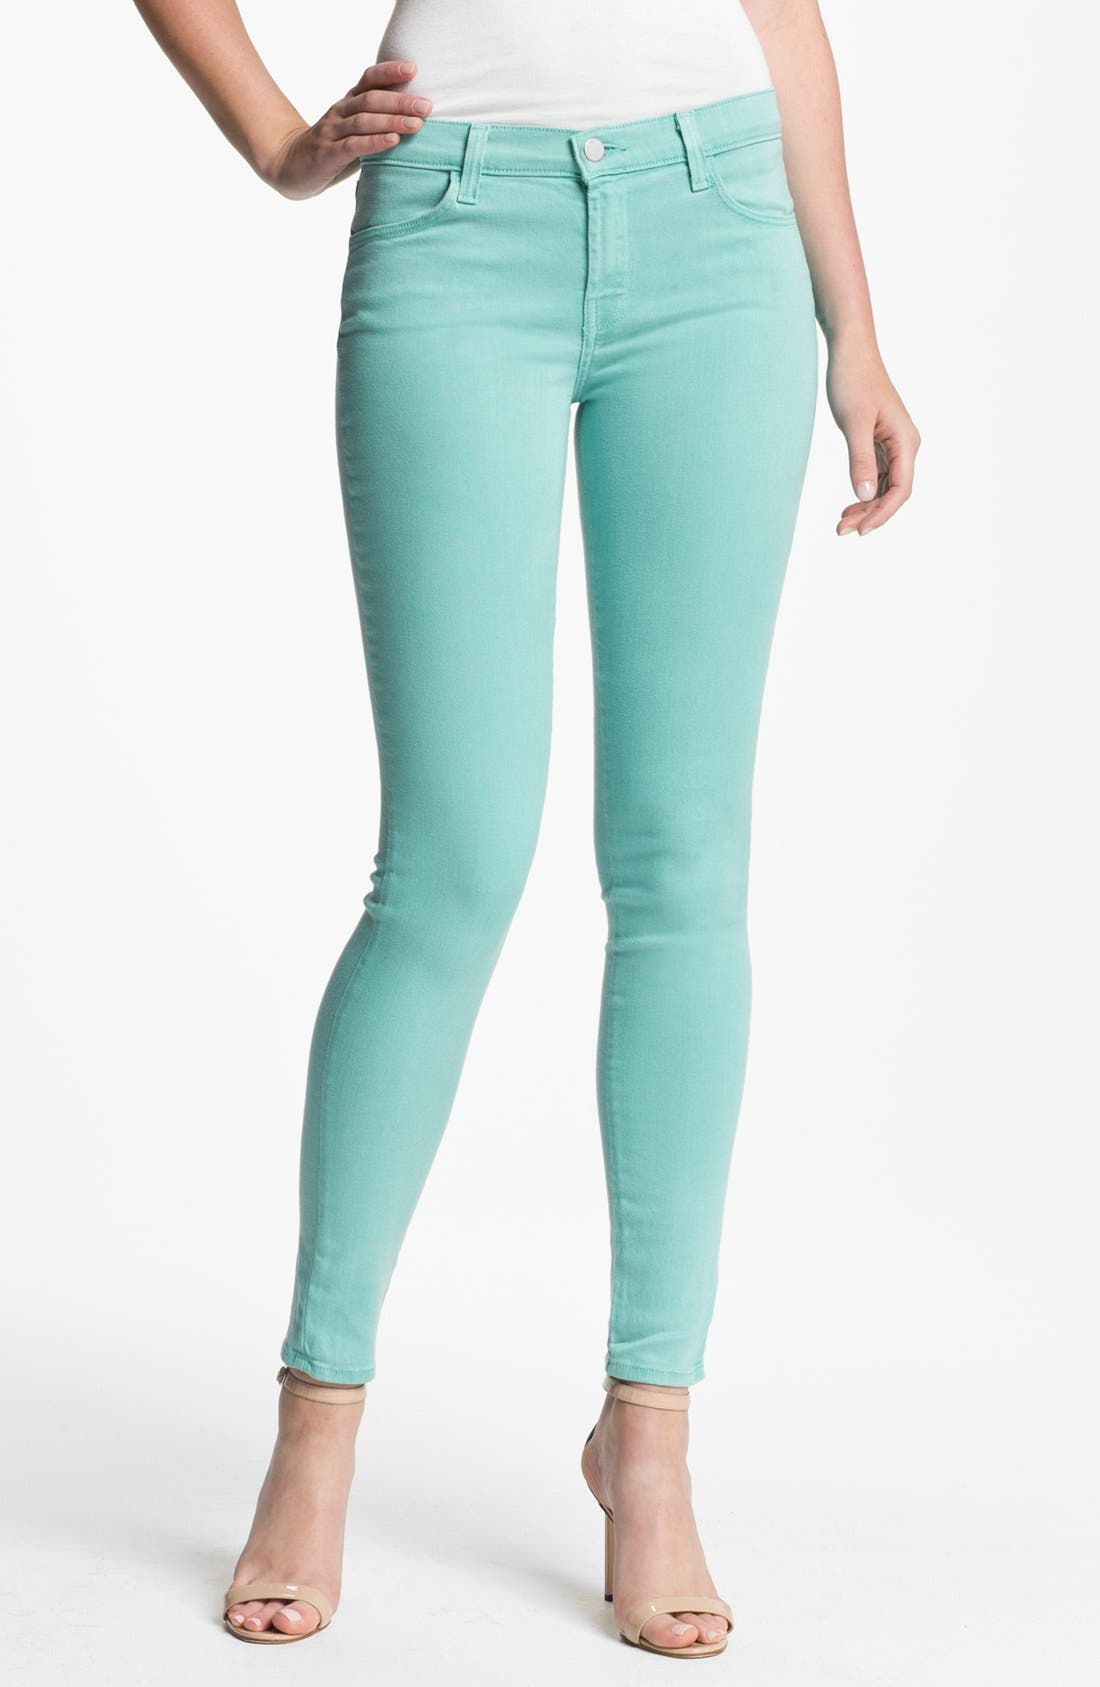 Alternate Image 1 Selected - J Brand '620' Overdyed Skinny Leg Jeans (Columbia)